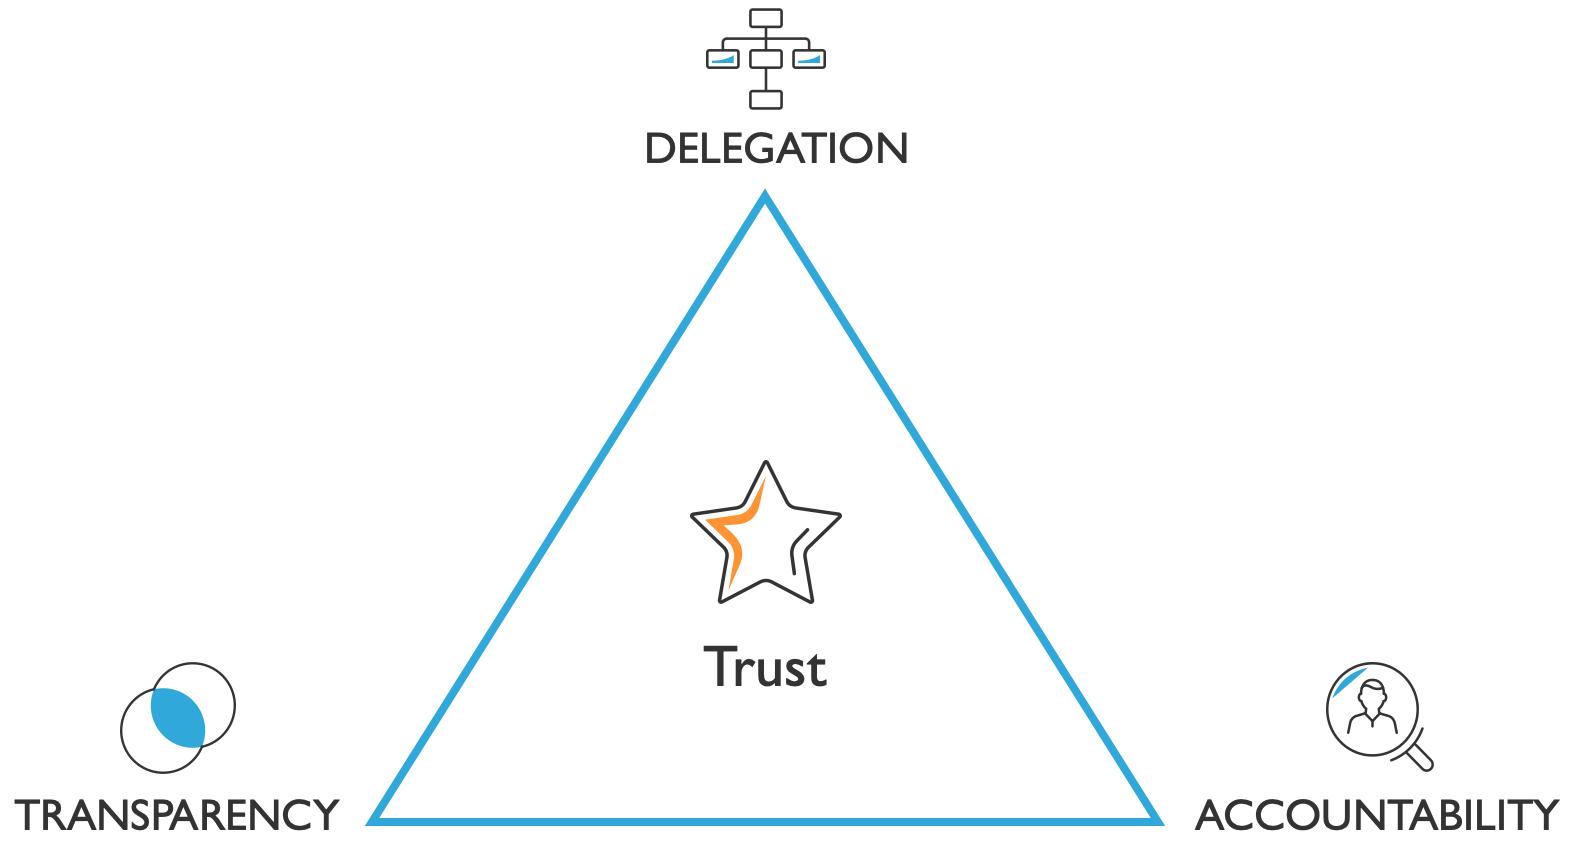 delegation+transparency+accountability=trust